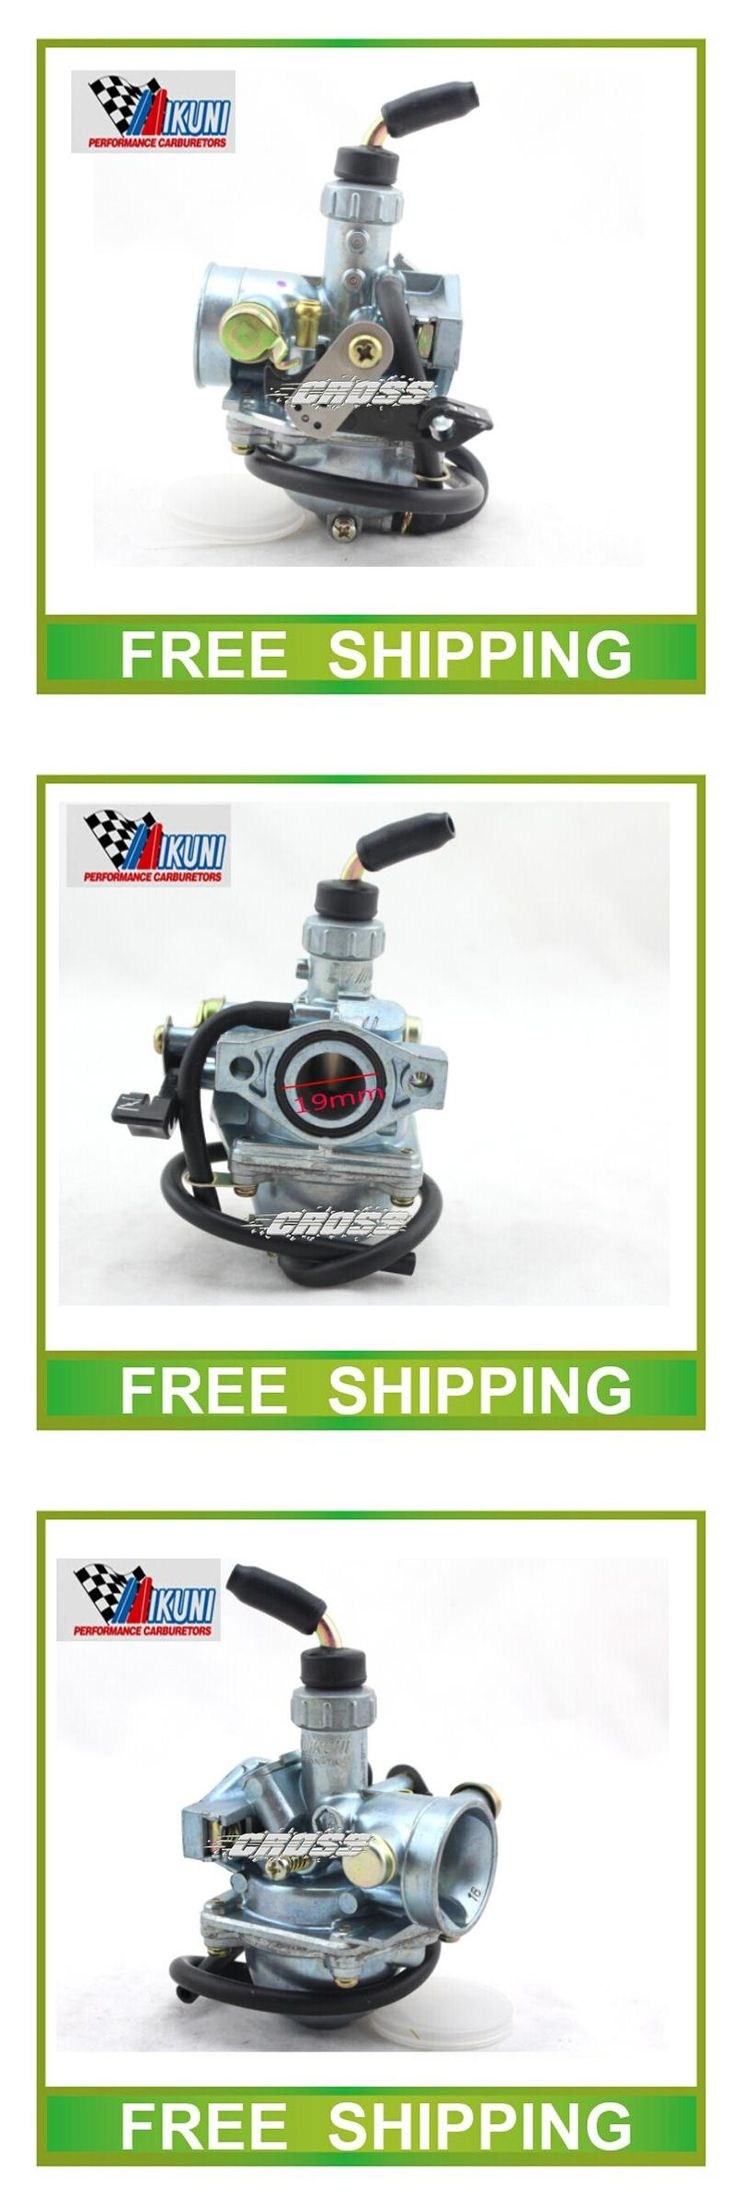 [Visit to Buy] 19mm carburetor mikuni vm16 50cc dirt bike atv pz19 performance BAJA50 XR50 CRF50 CRF70 Bike ATV free shipping #Advertisement